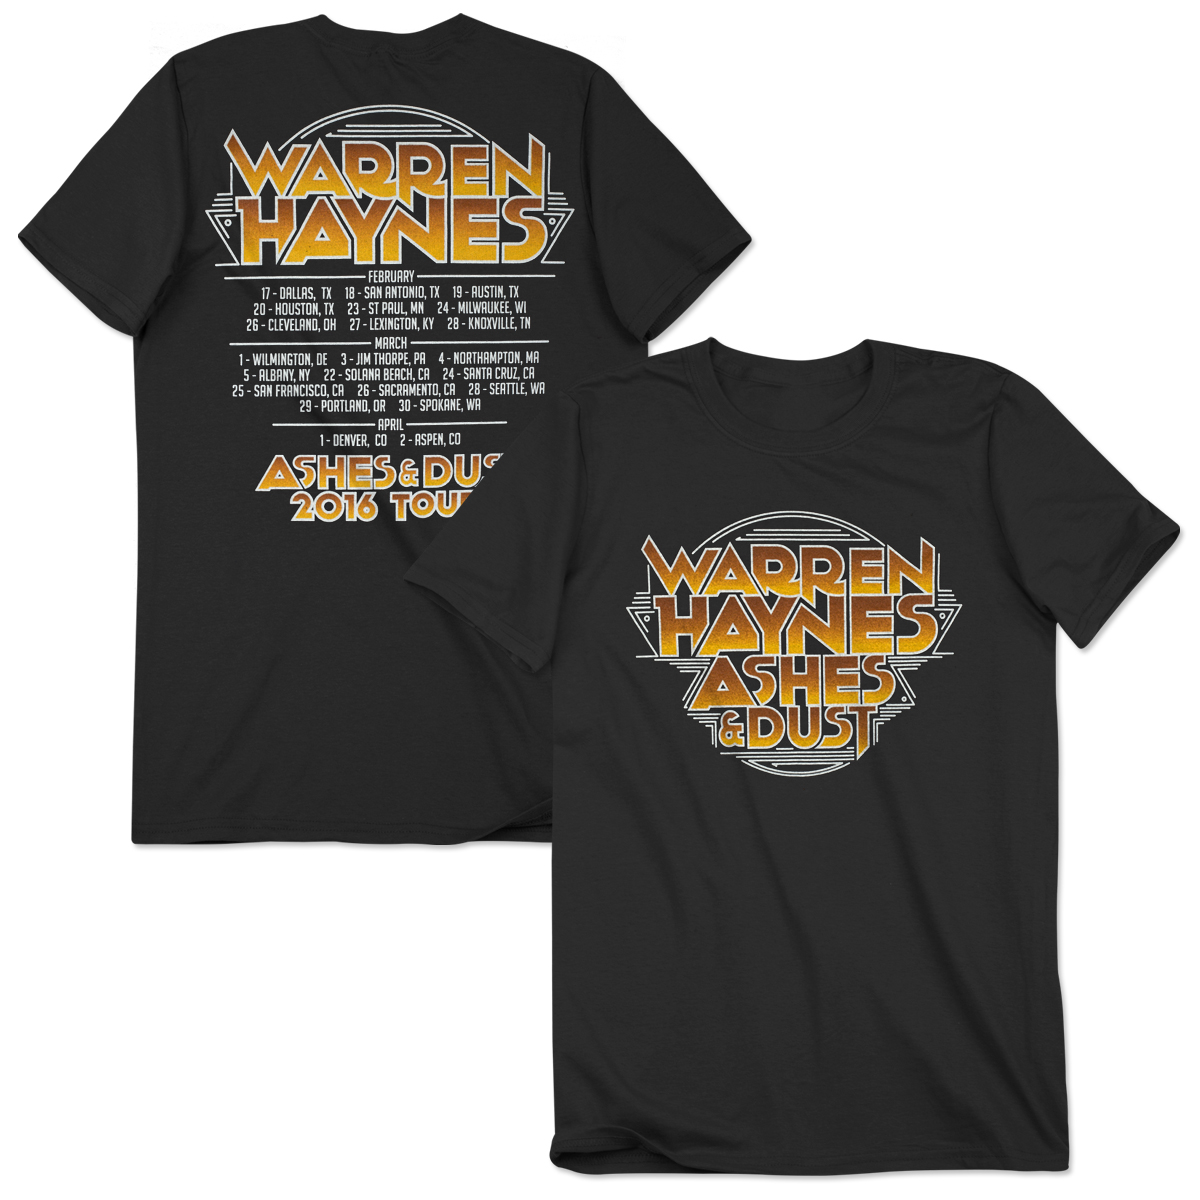 Warren Haynes 2016 Spring Tour T-Shirt